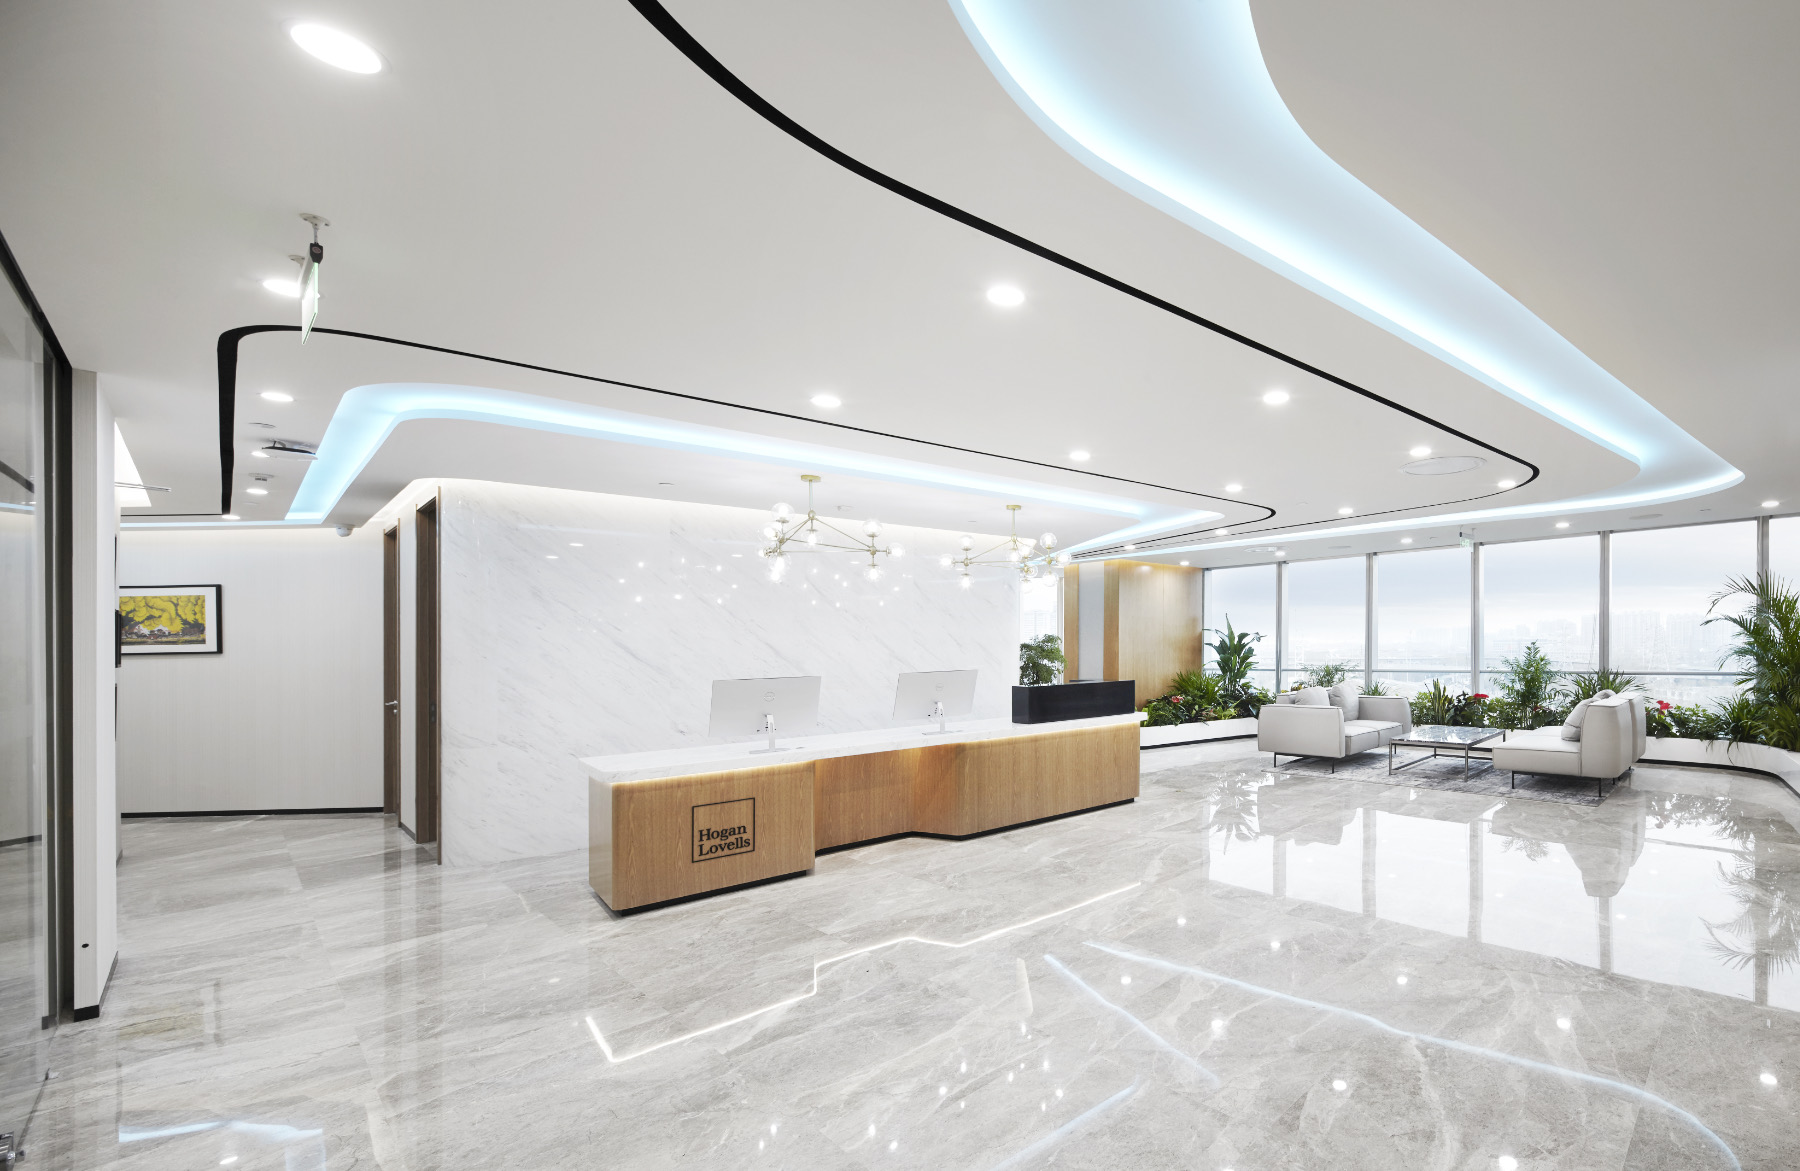 hogan-lovells-beijing-office-2